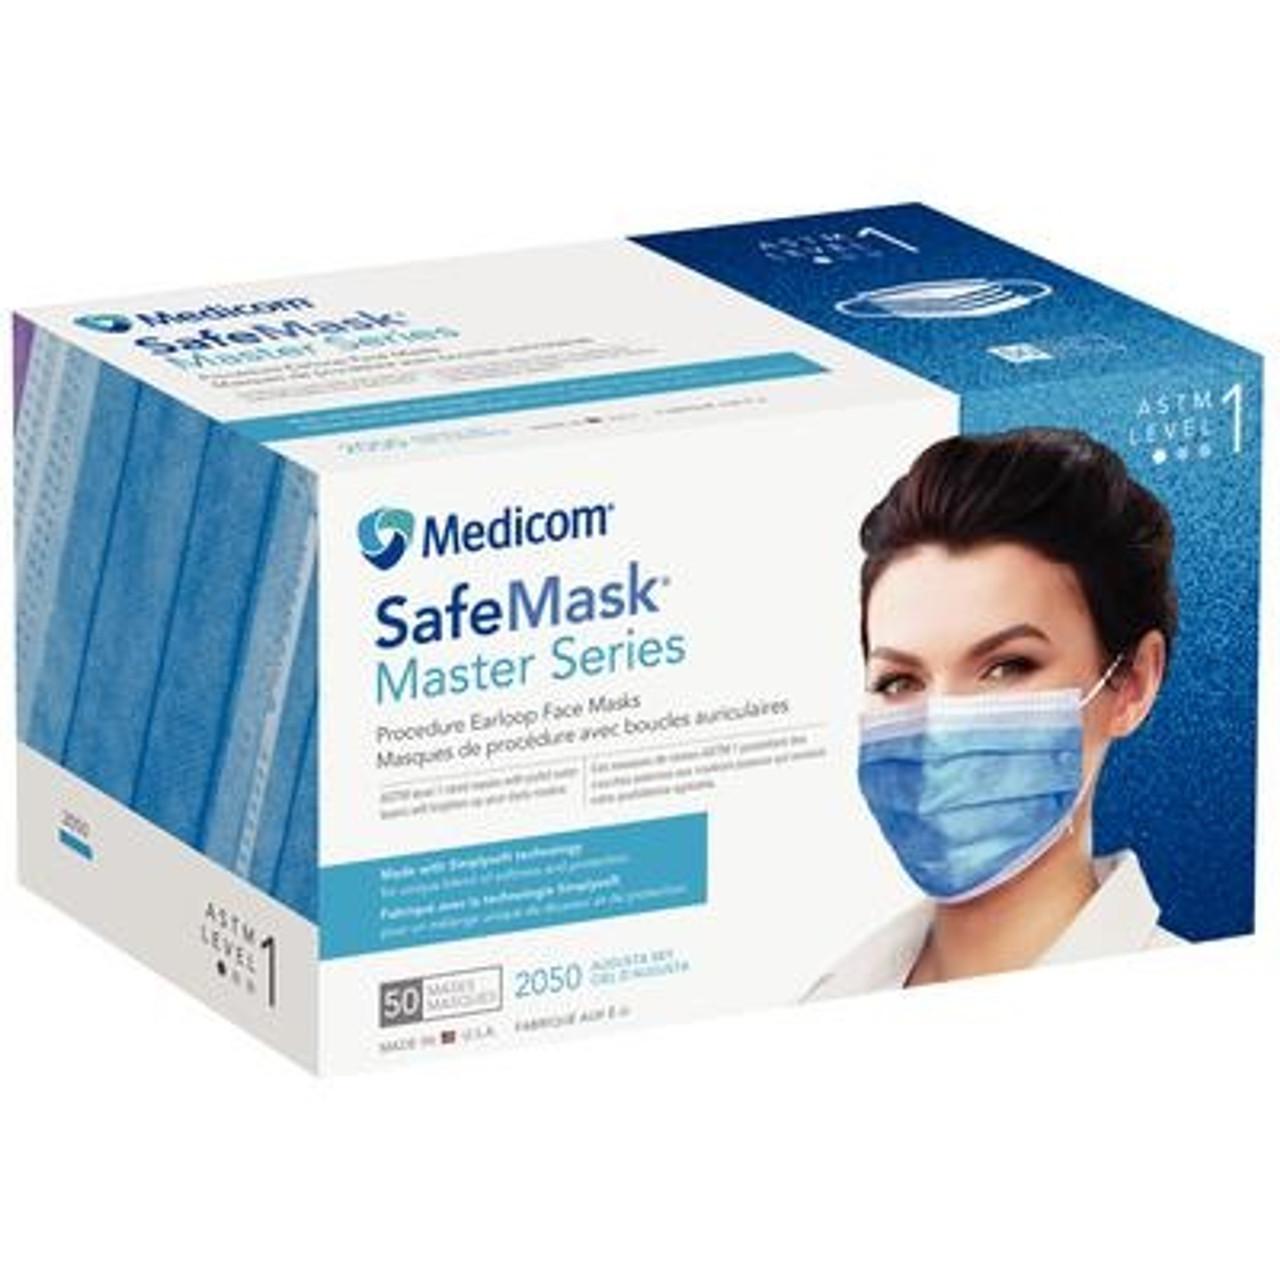 Safemask® Masterseries Sky Medicom Level 1 Earloop Augusta box - Mask 50